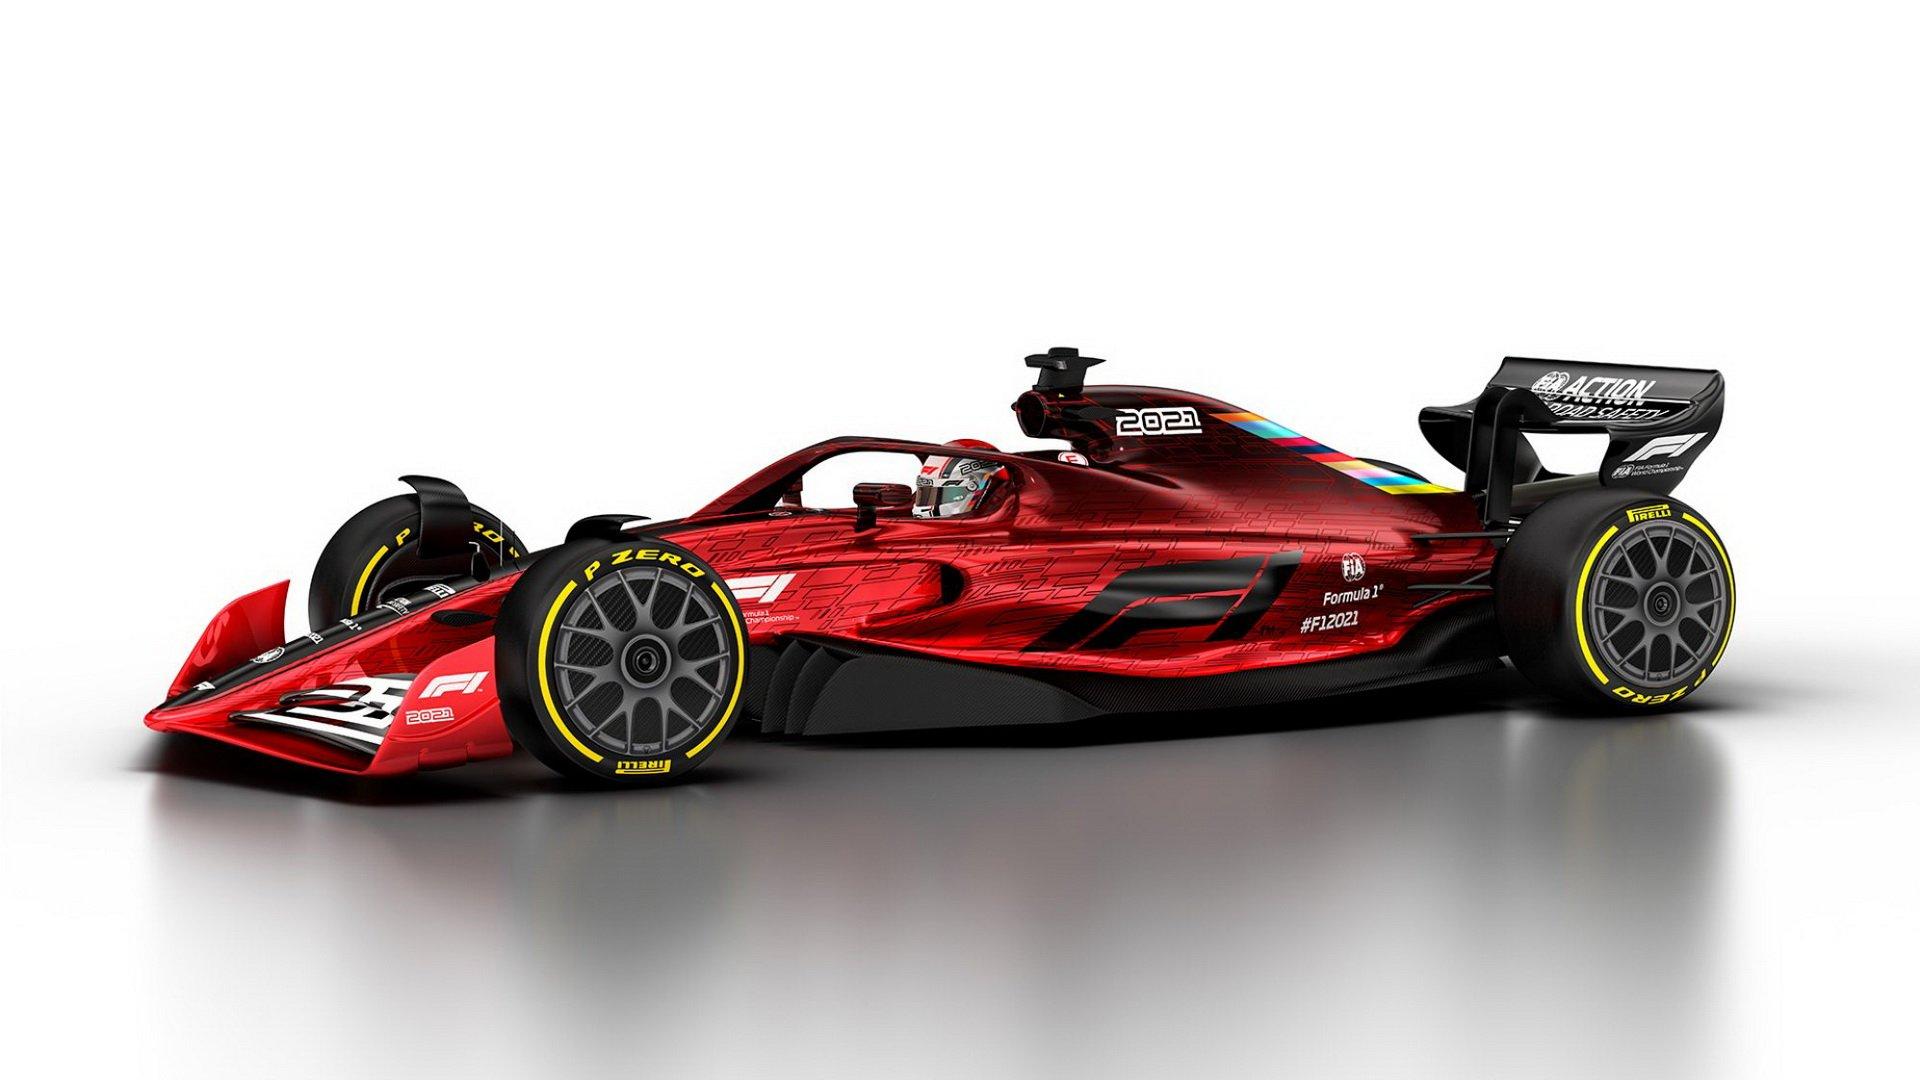 Formula-1-2021-cars-7